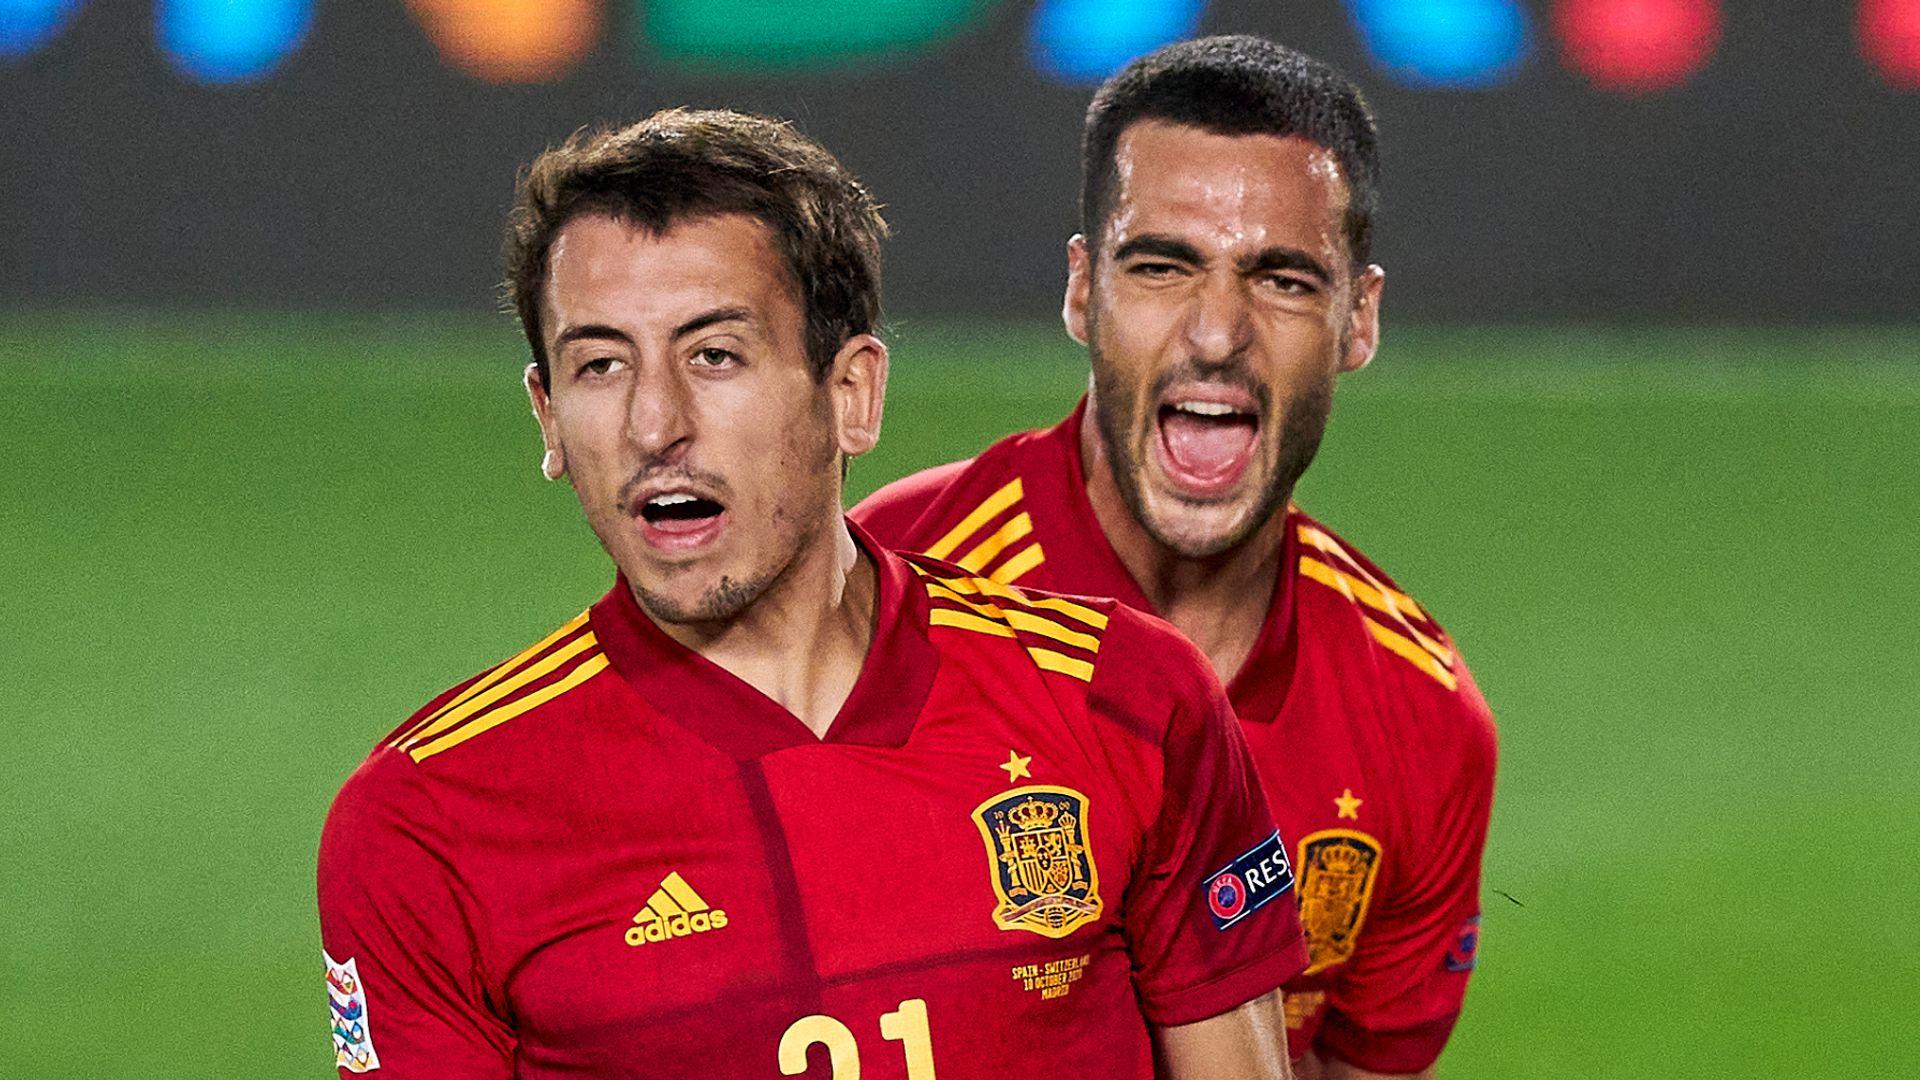 Nations League LIVE: Germany, Spain ahead early